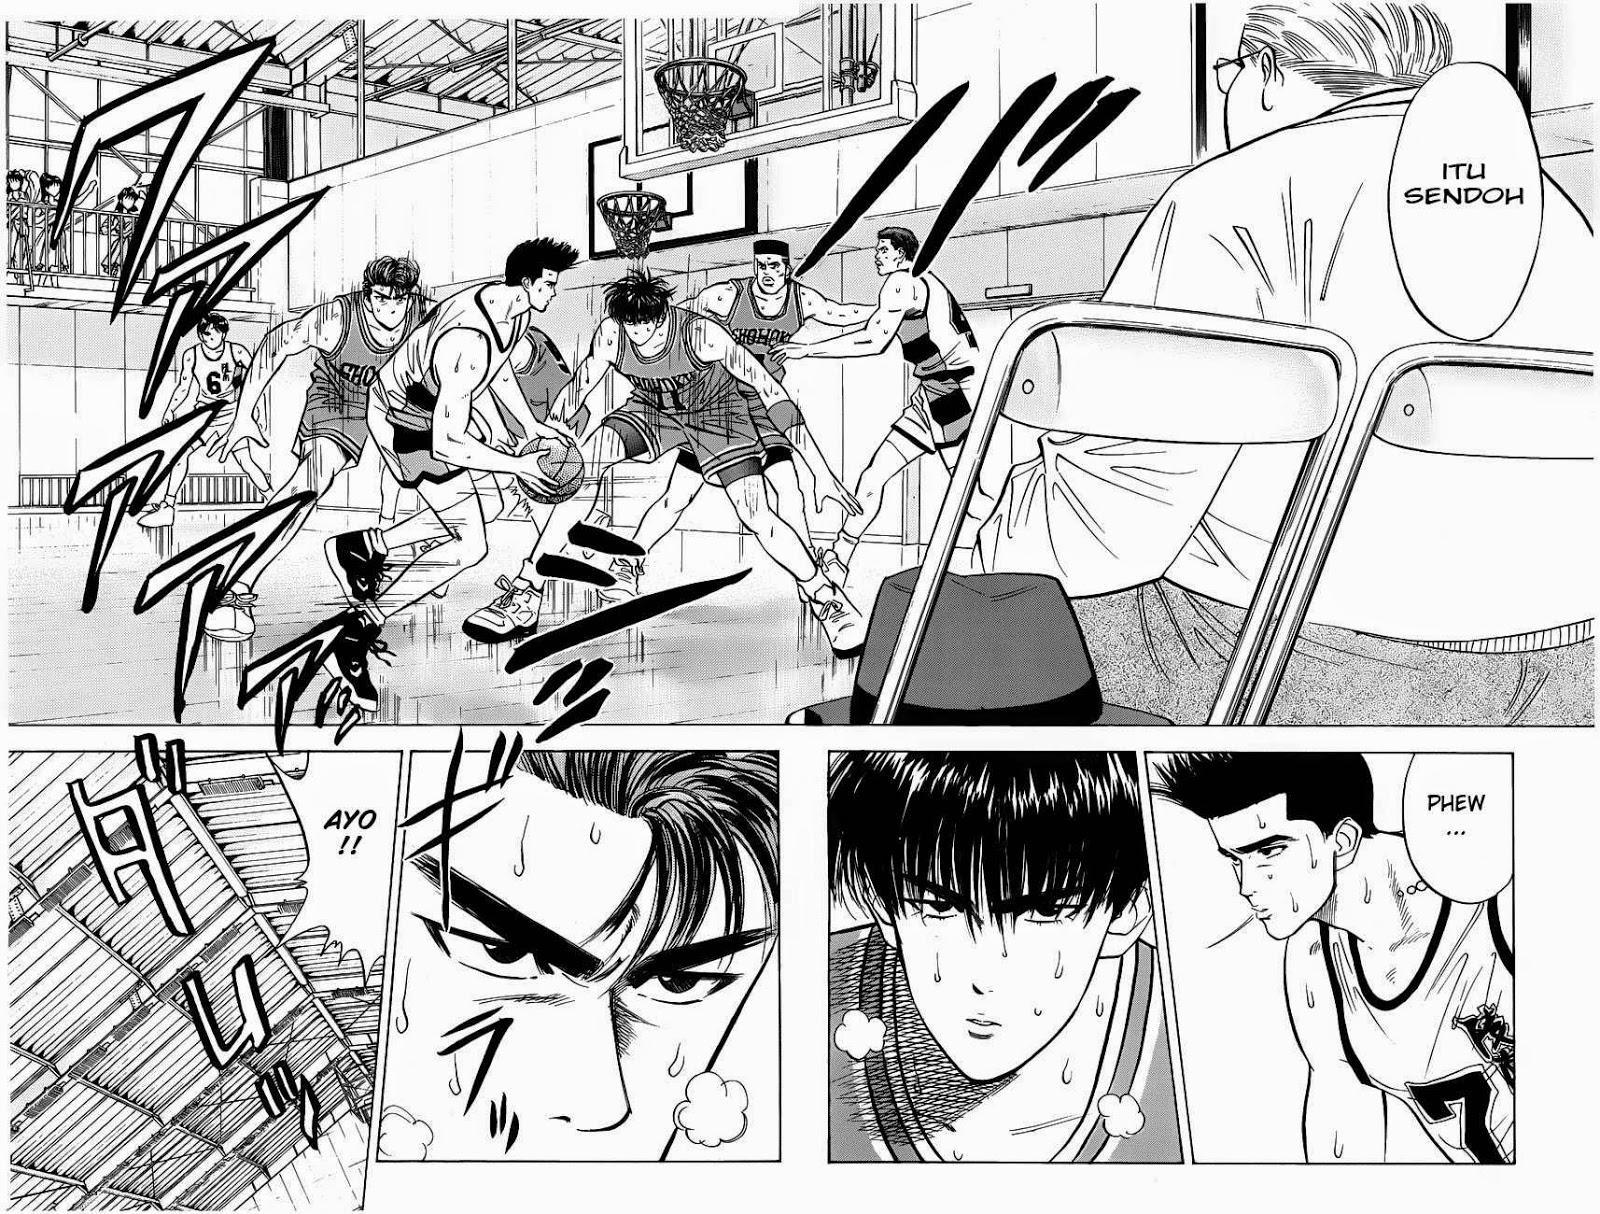 Komik slam dunk 044 - sendoh 45 Indonesia slam dunk 044 - sendoh Terbaru 17|Baca Manga Komik Indonesia|